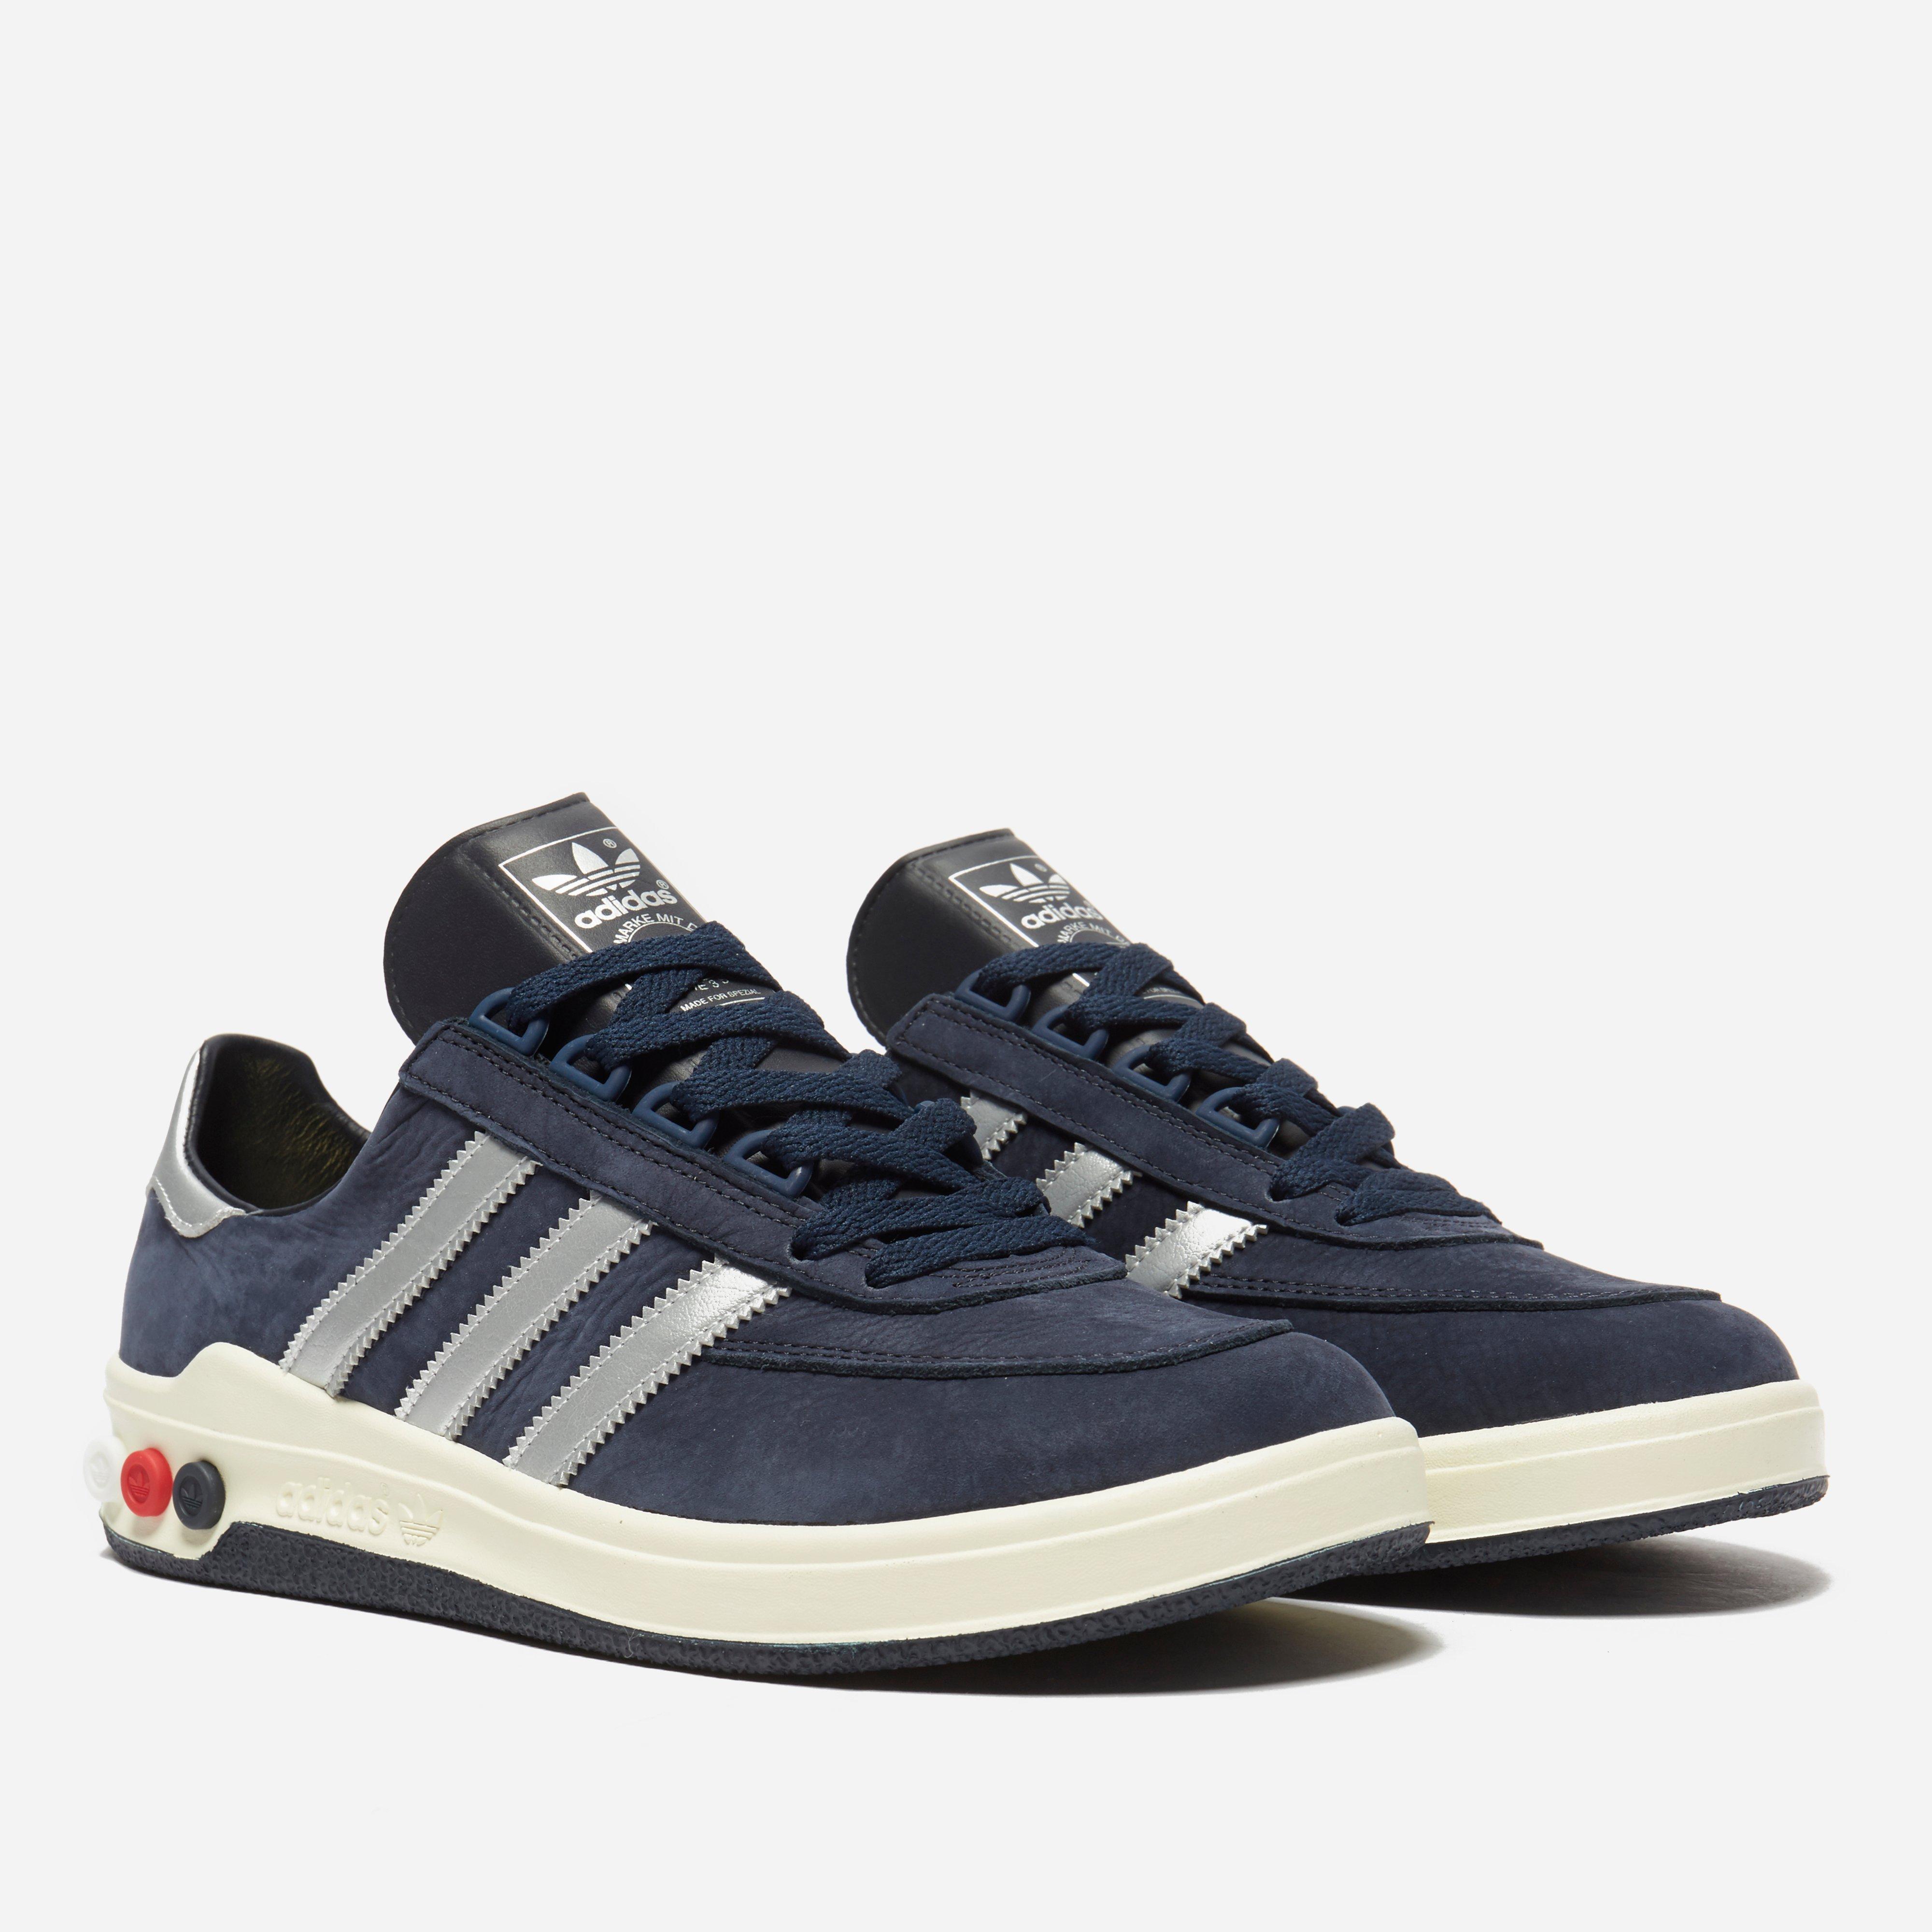 adidas Originals Columbia SPZL